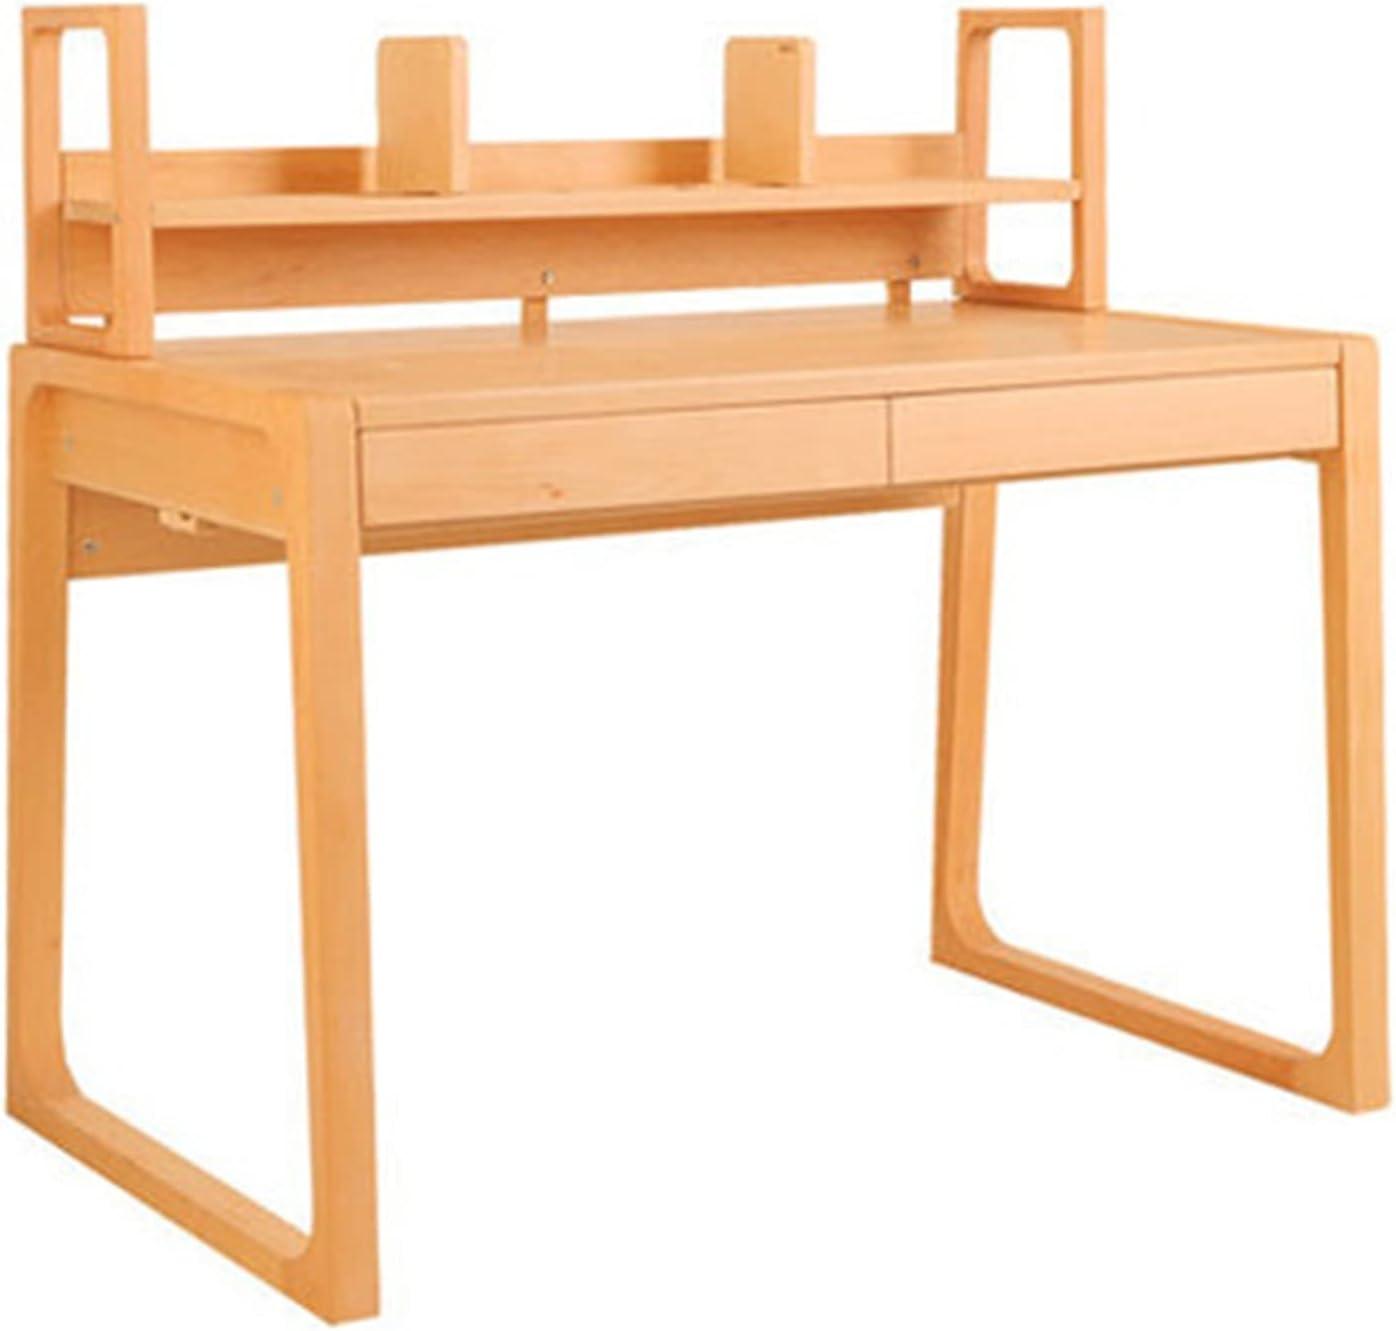 LMZZ Solid Wood Study Desks Ranking Albuquerque Mall TOP8 Children's Room D